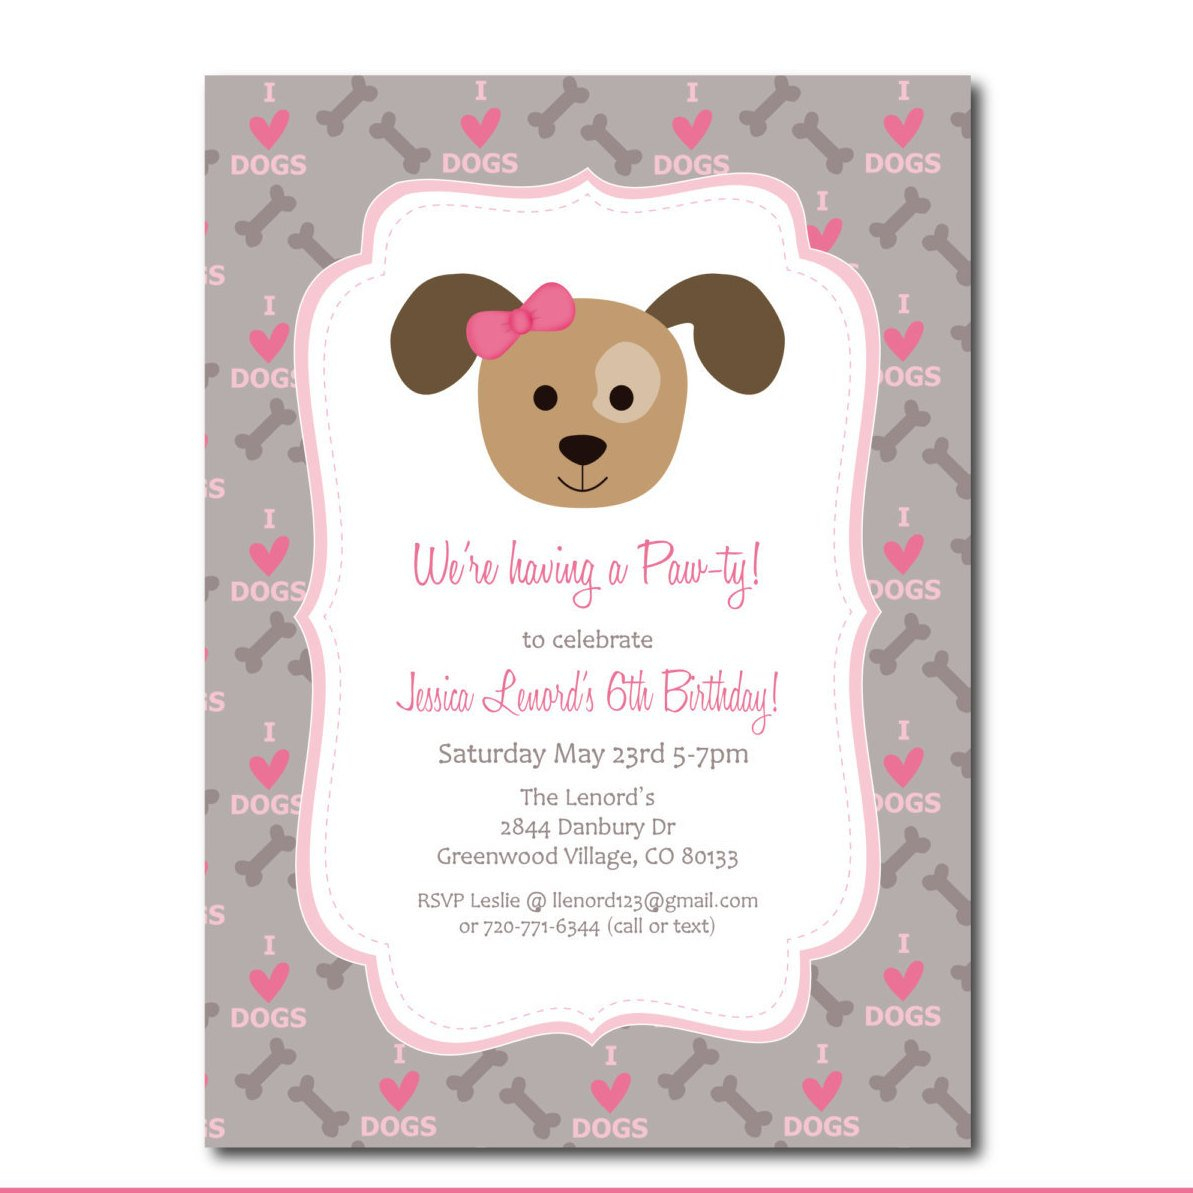 Puppy Shower Invitations Free Free Printable Puppy Shower Invitations - Dog Birthday Invitations Free Printable